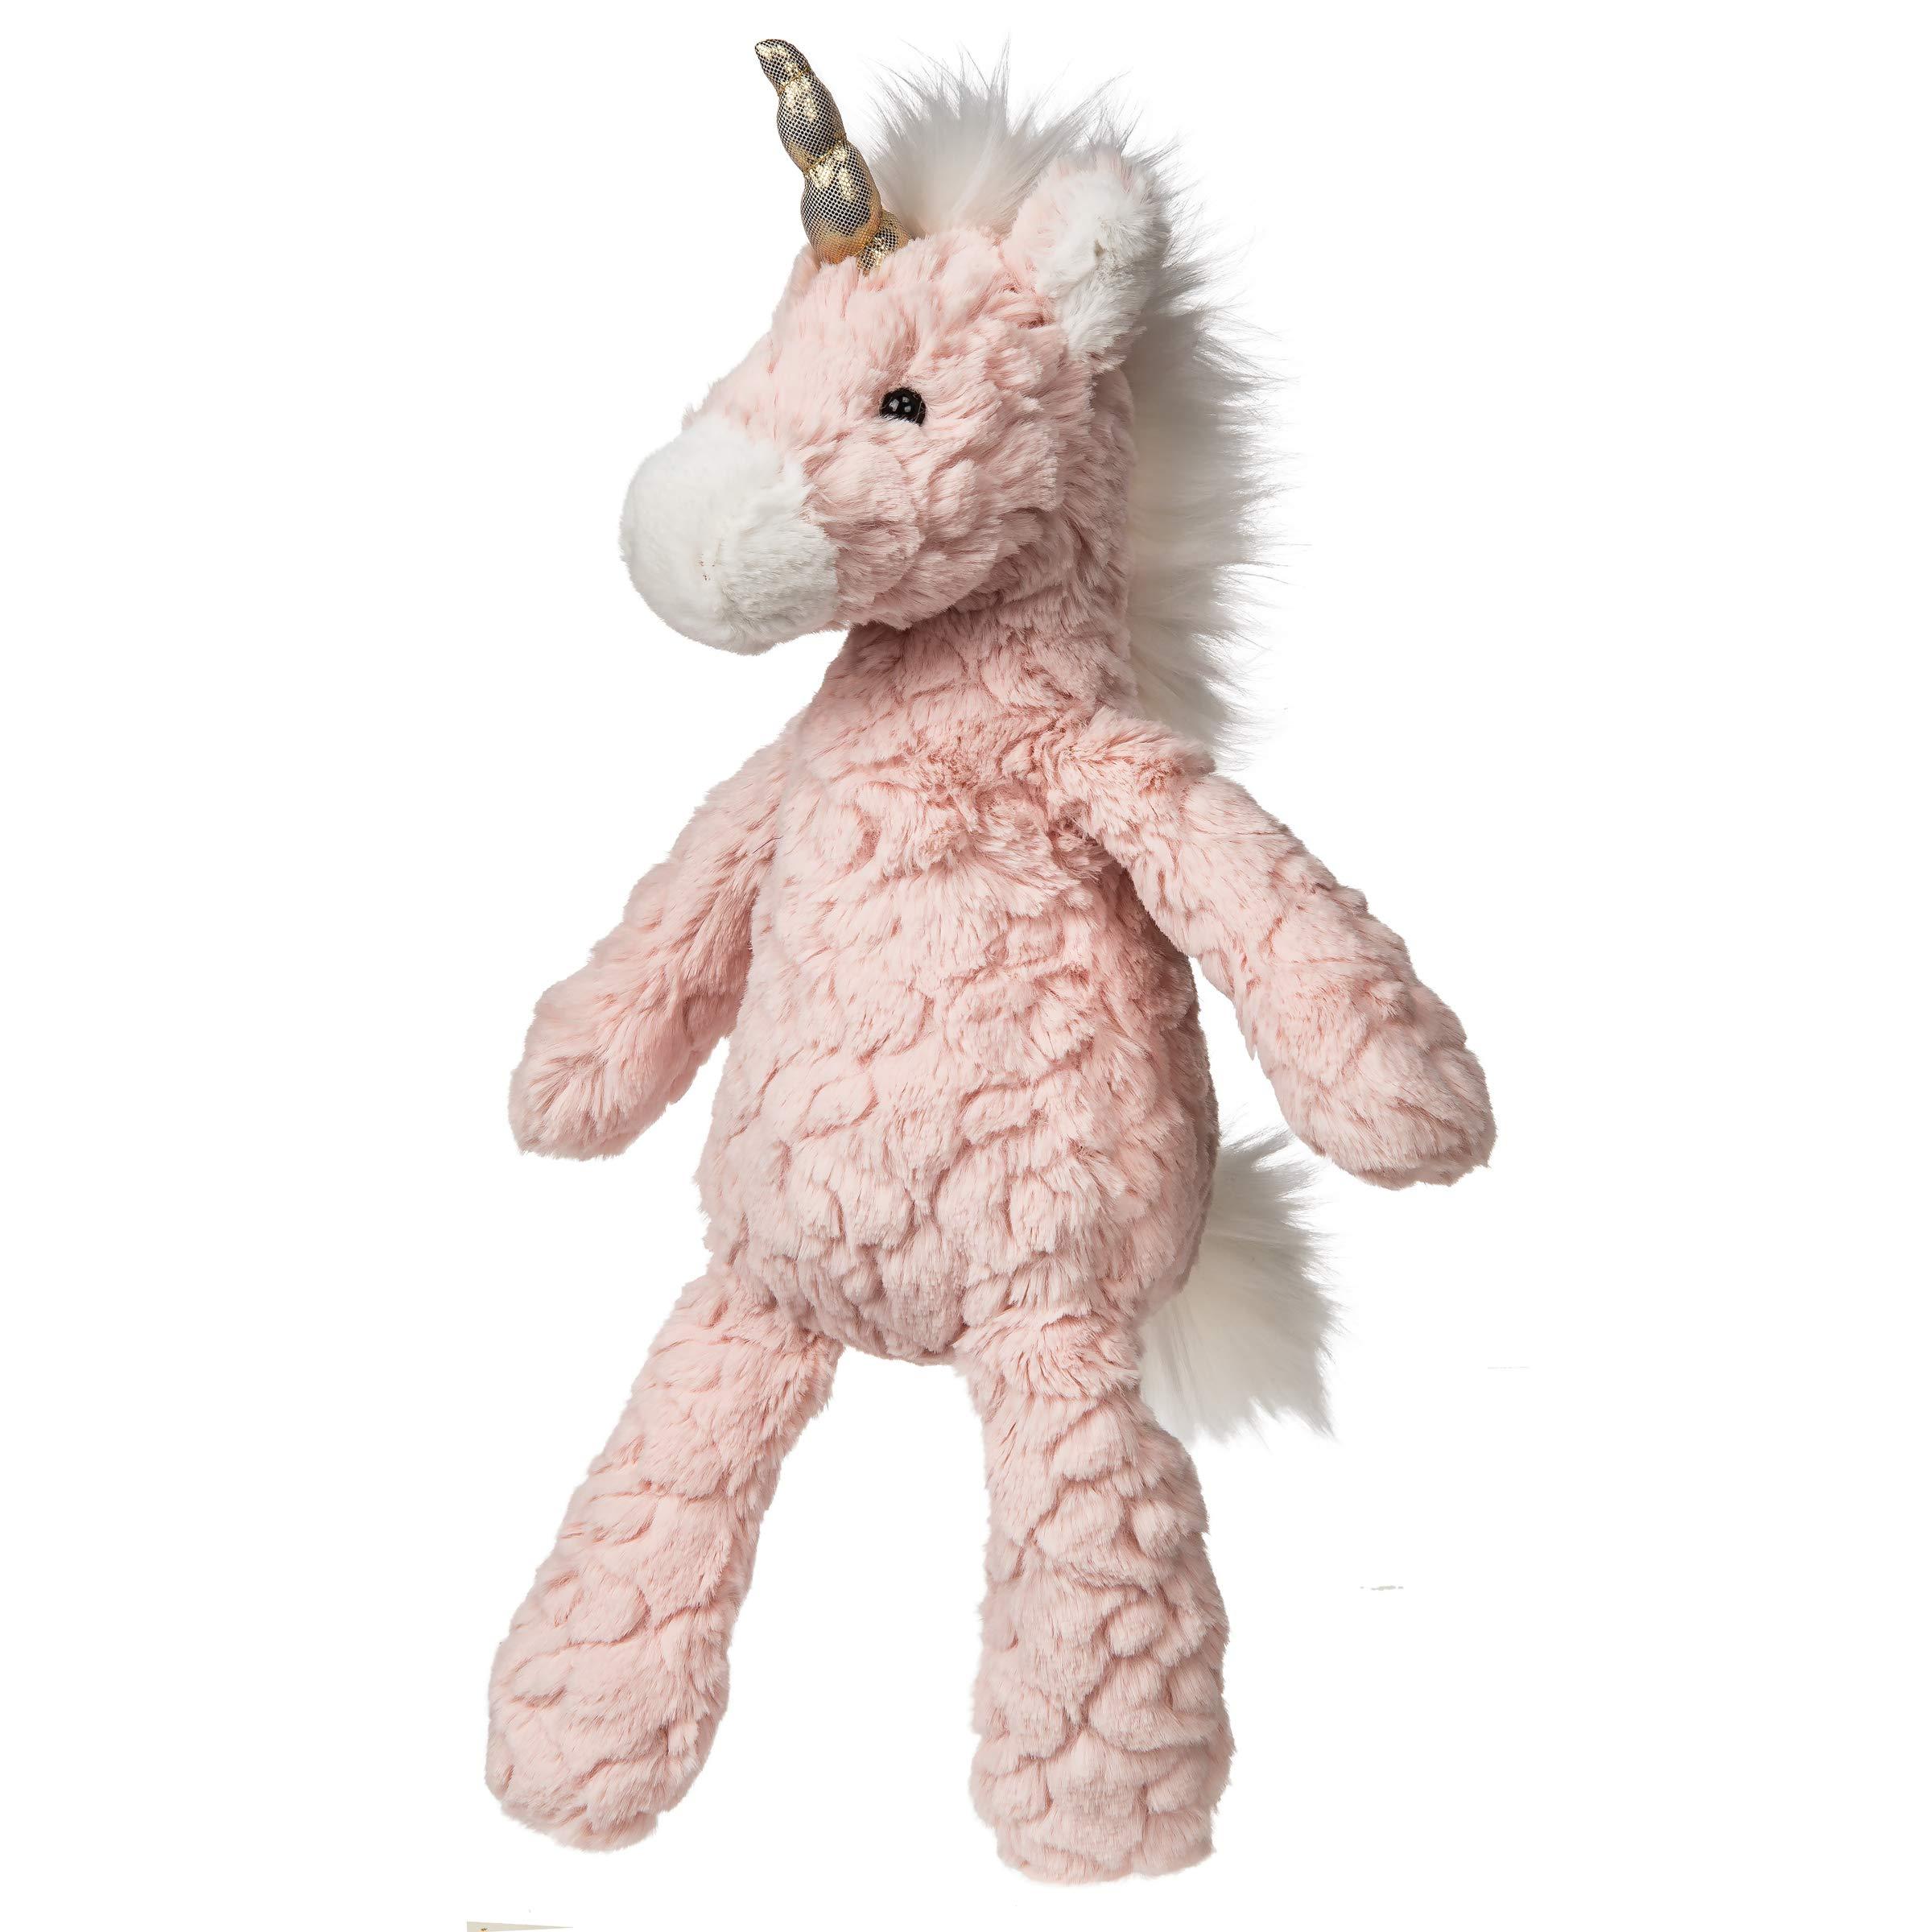 Mary Meyer Blush Putty Stuffed Animal Soft Toy, Unicorn, 13-Inches by Mary Meyer